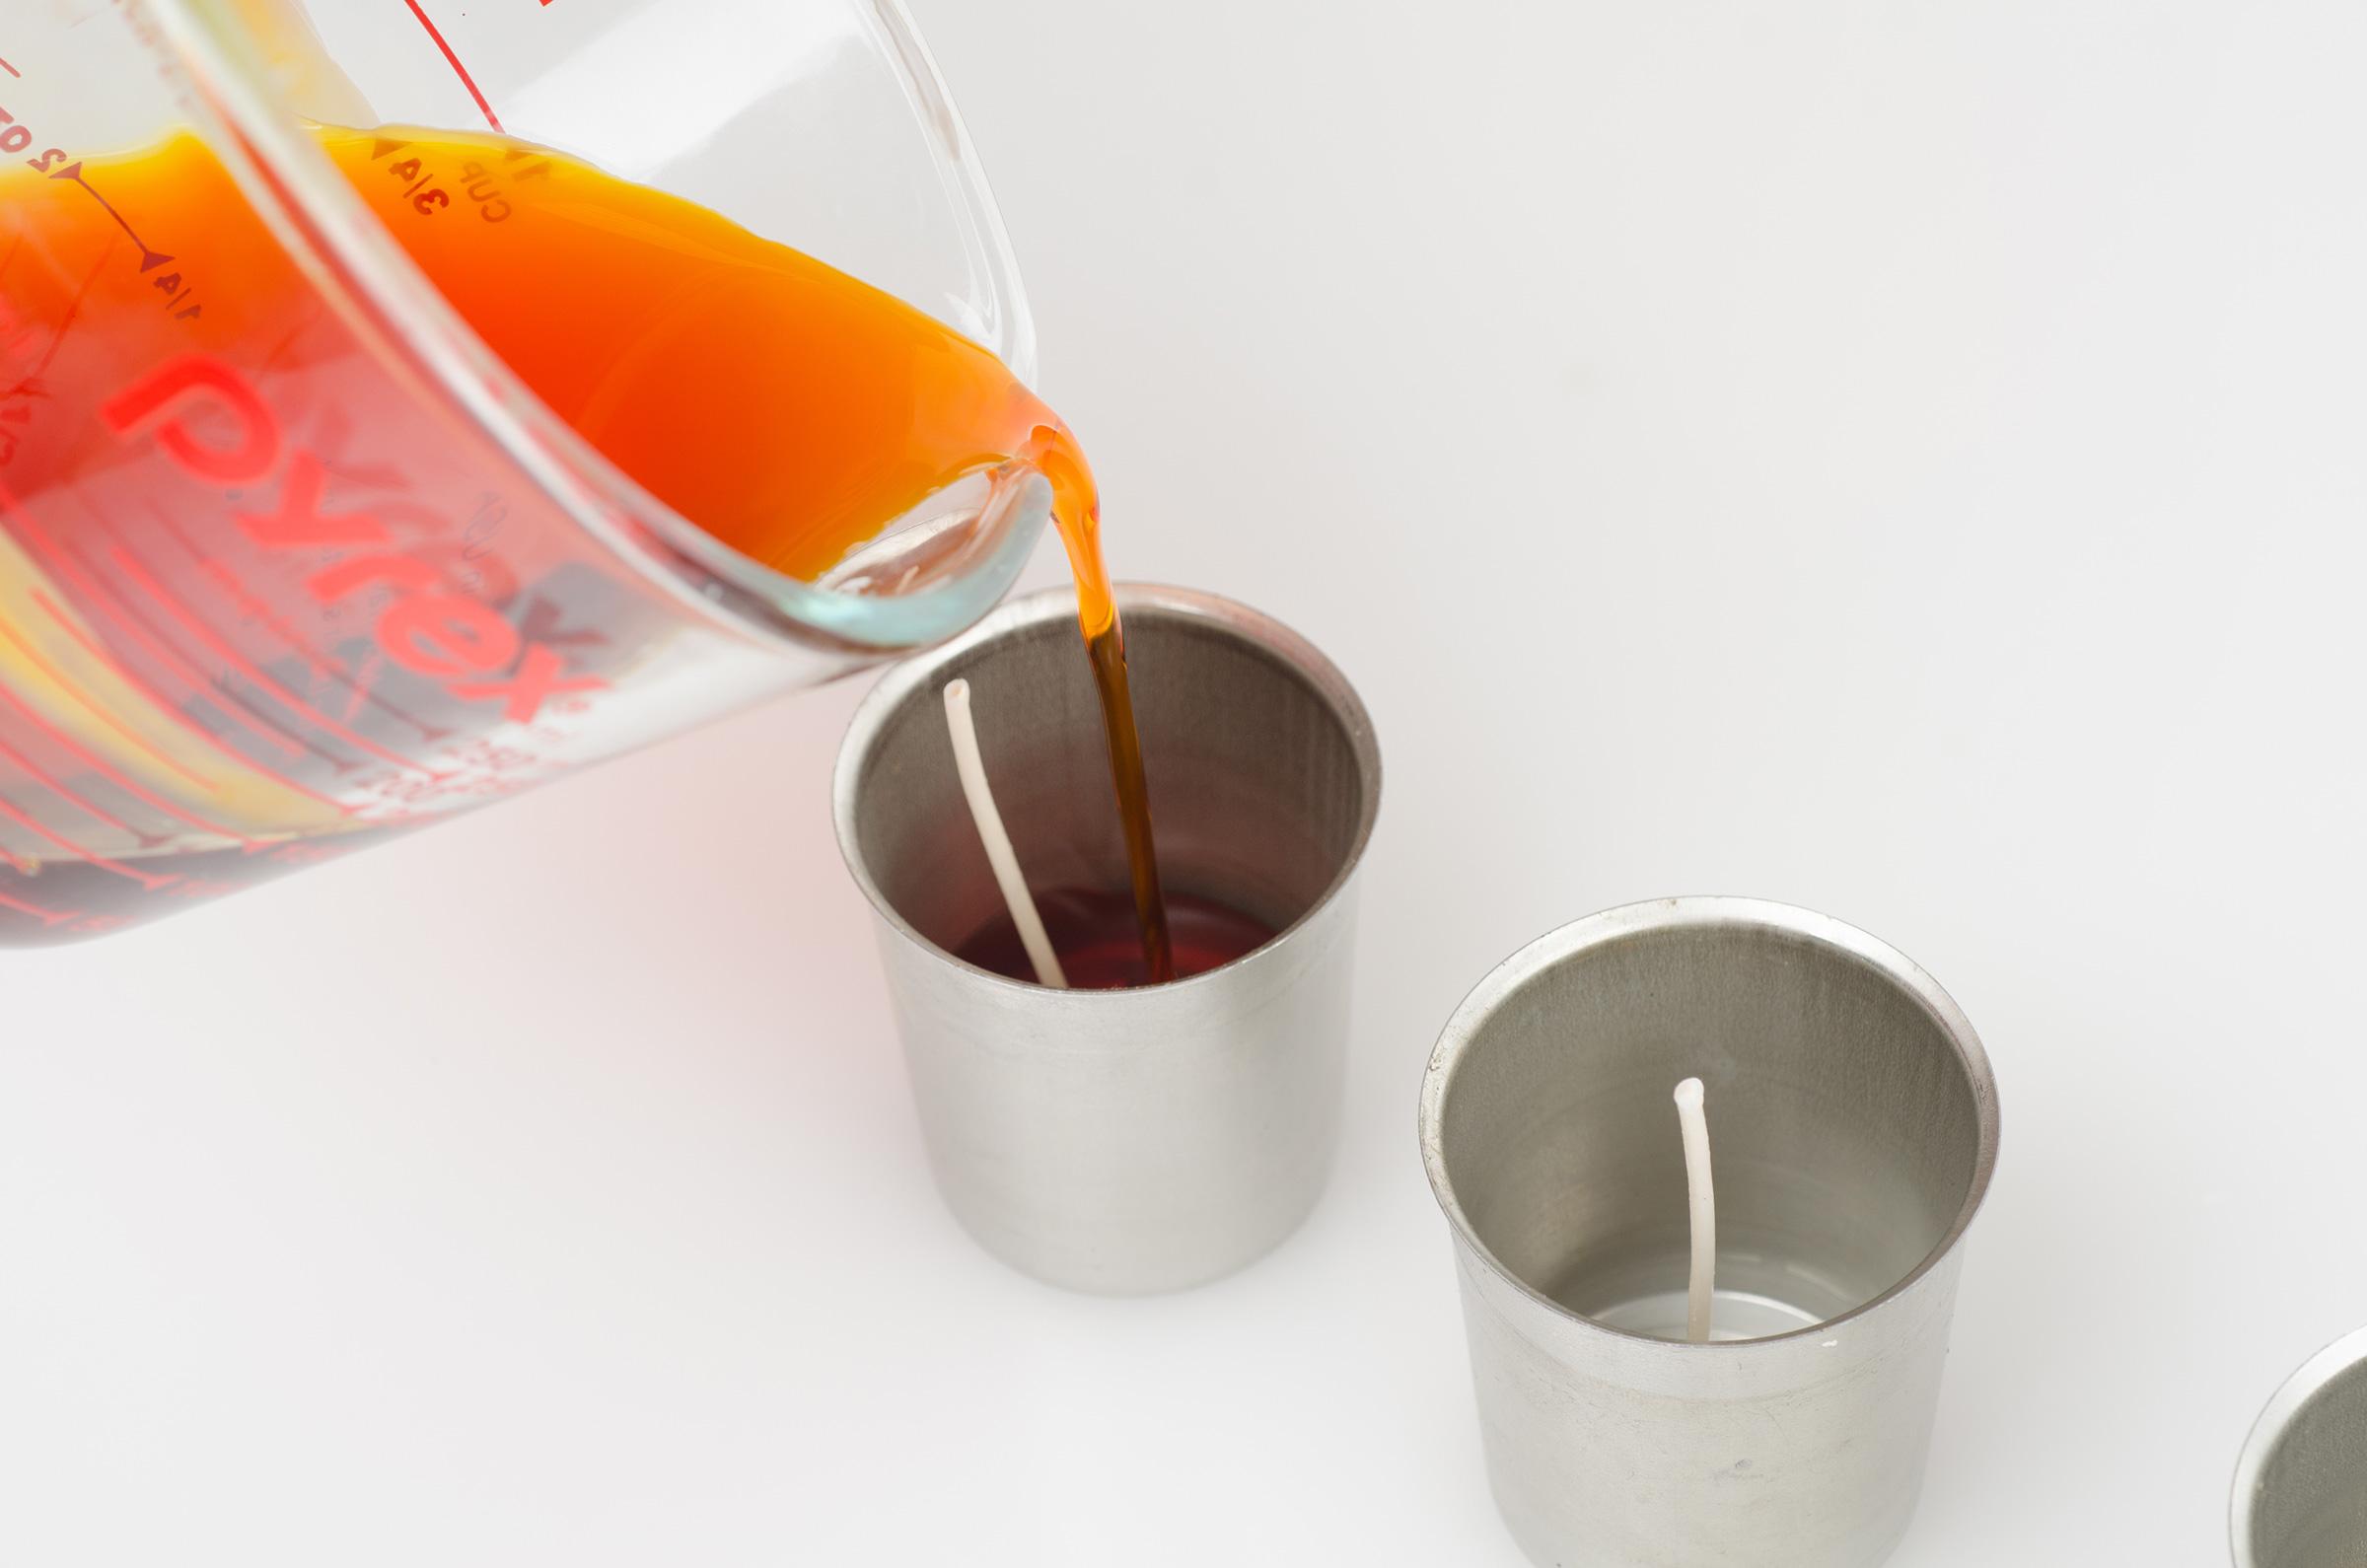 add orange liquid premium colorant and pour first layer